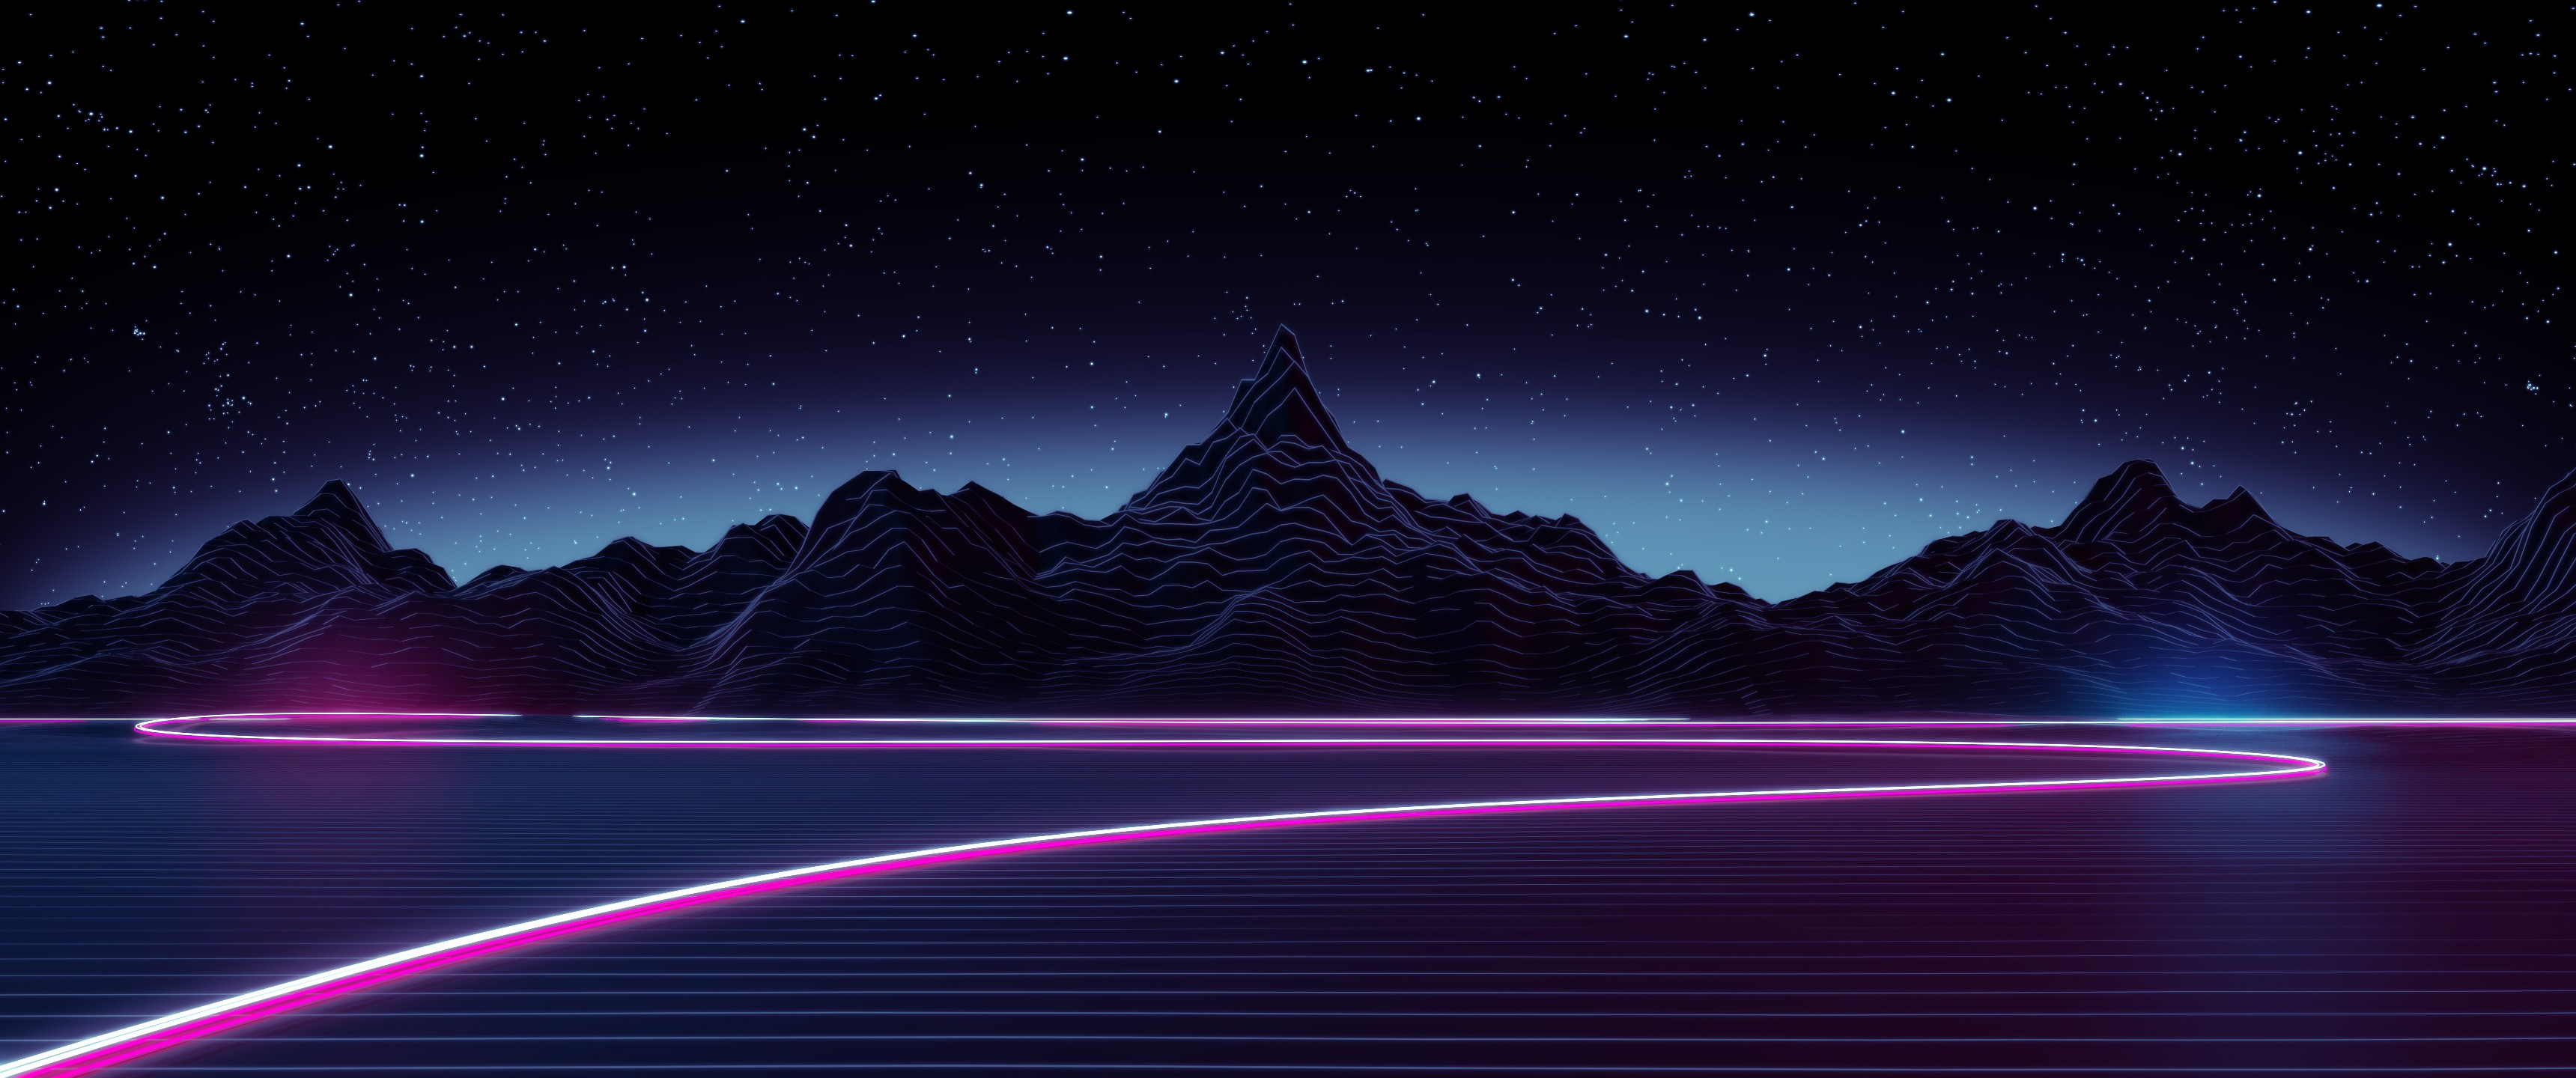 Synthwave wallpaper download free high resolution - Free 1920x1080 desktop wallpaper ...